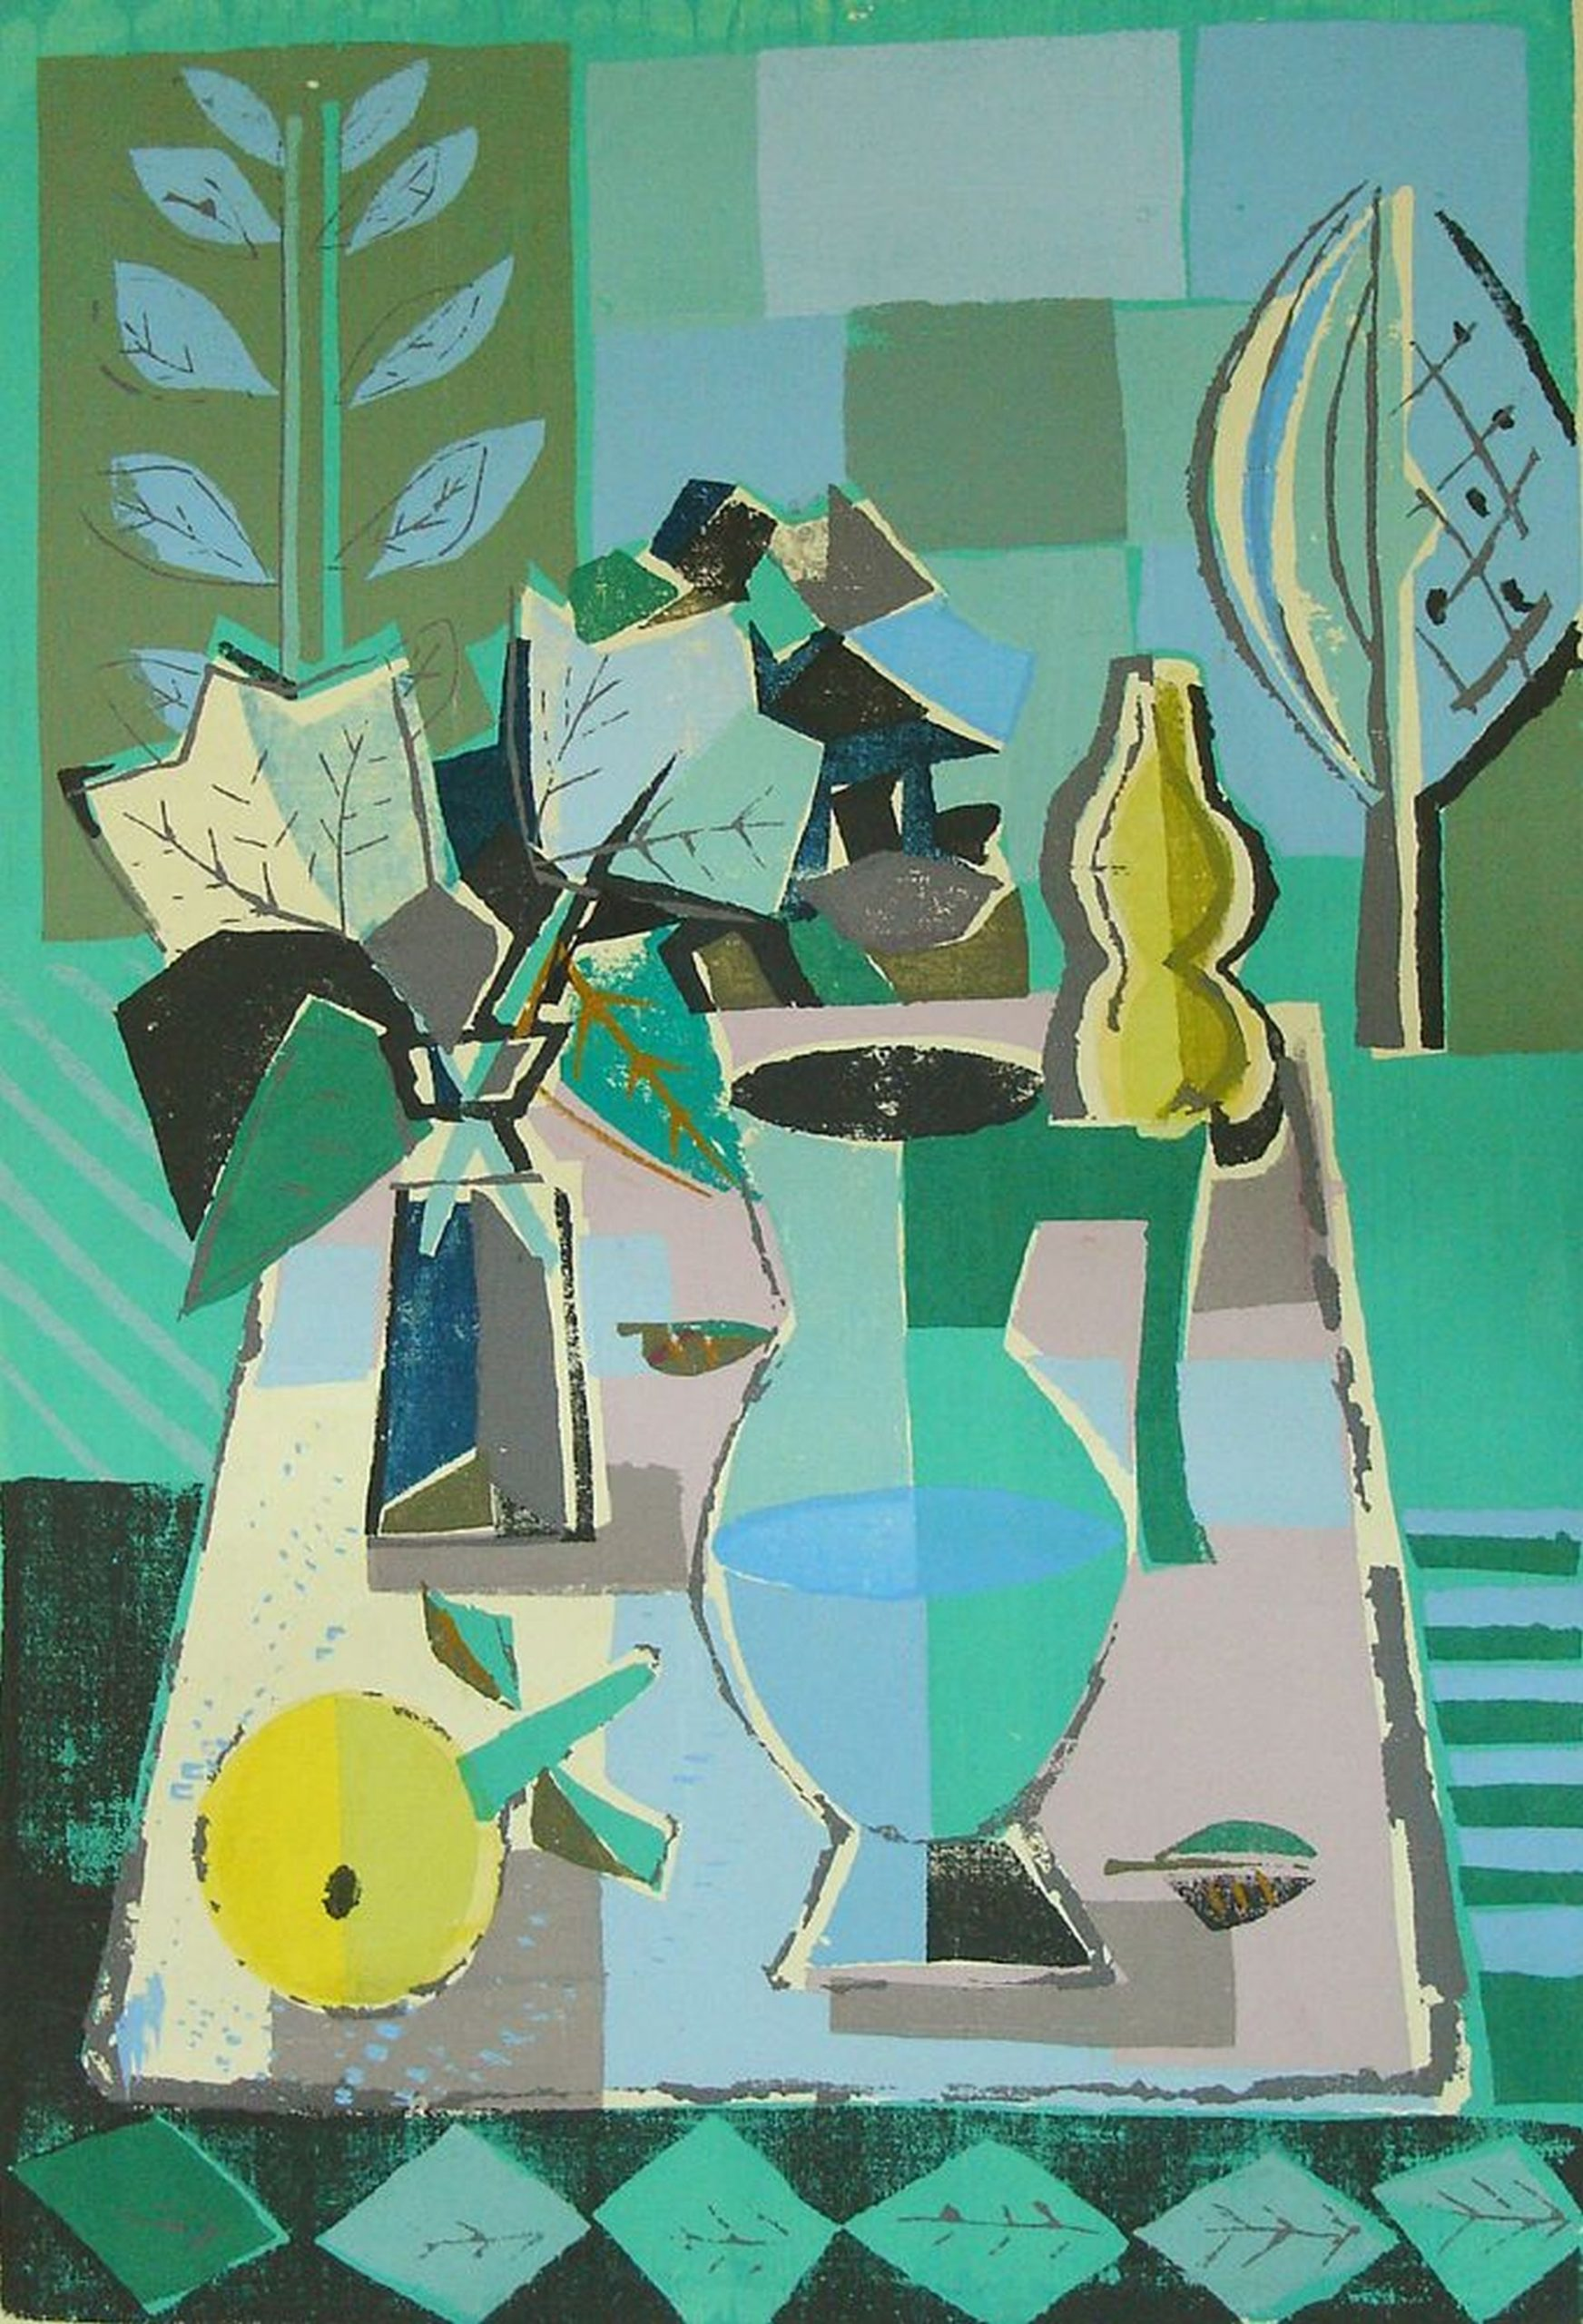 Wolf Hoffmann-Still life with a jug